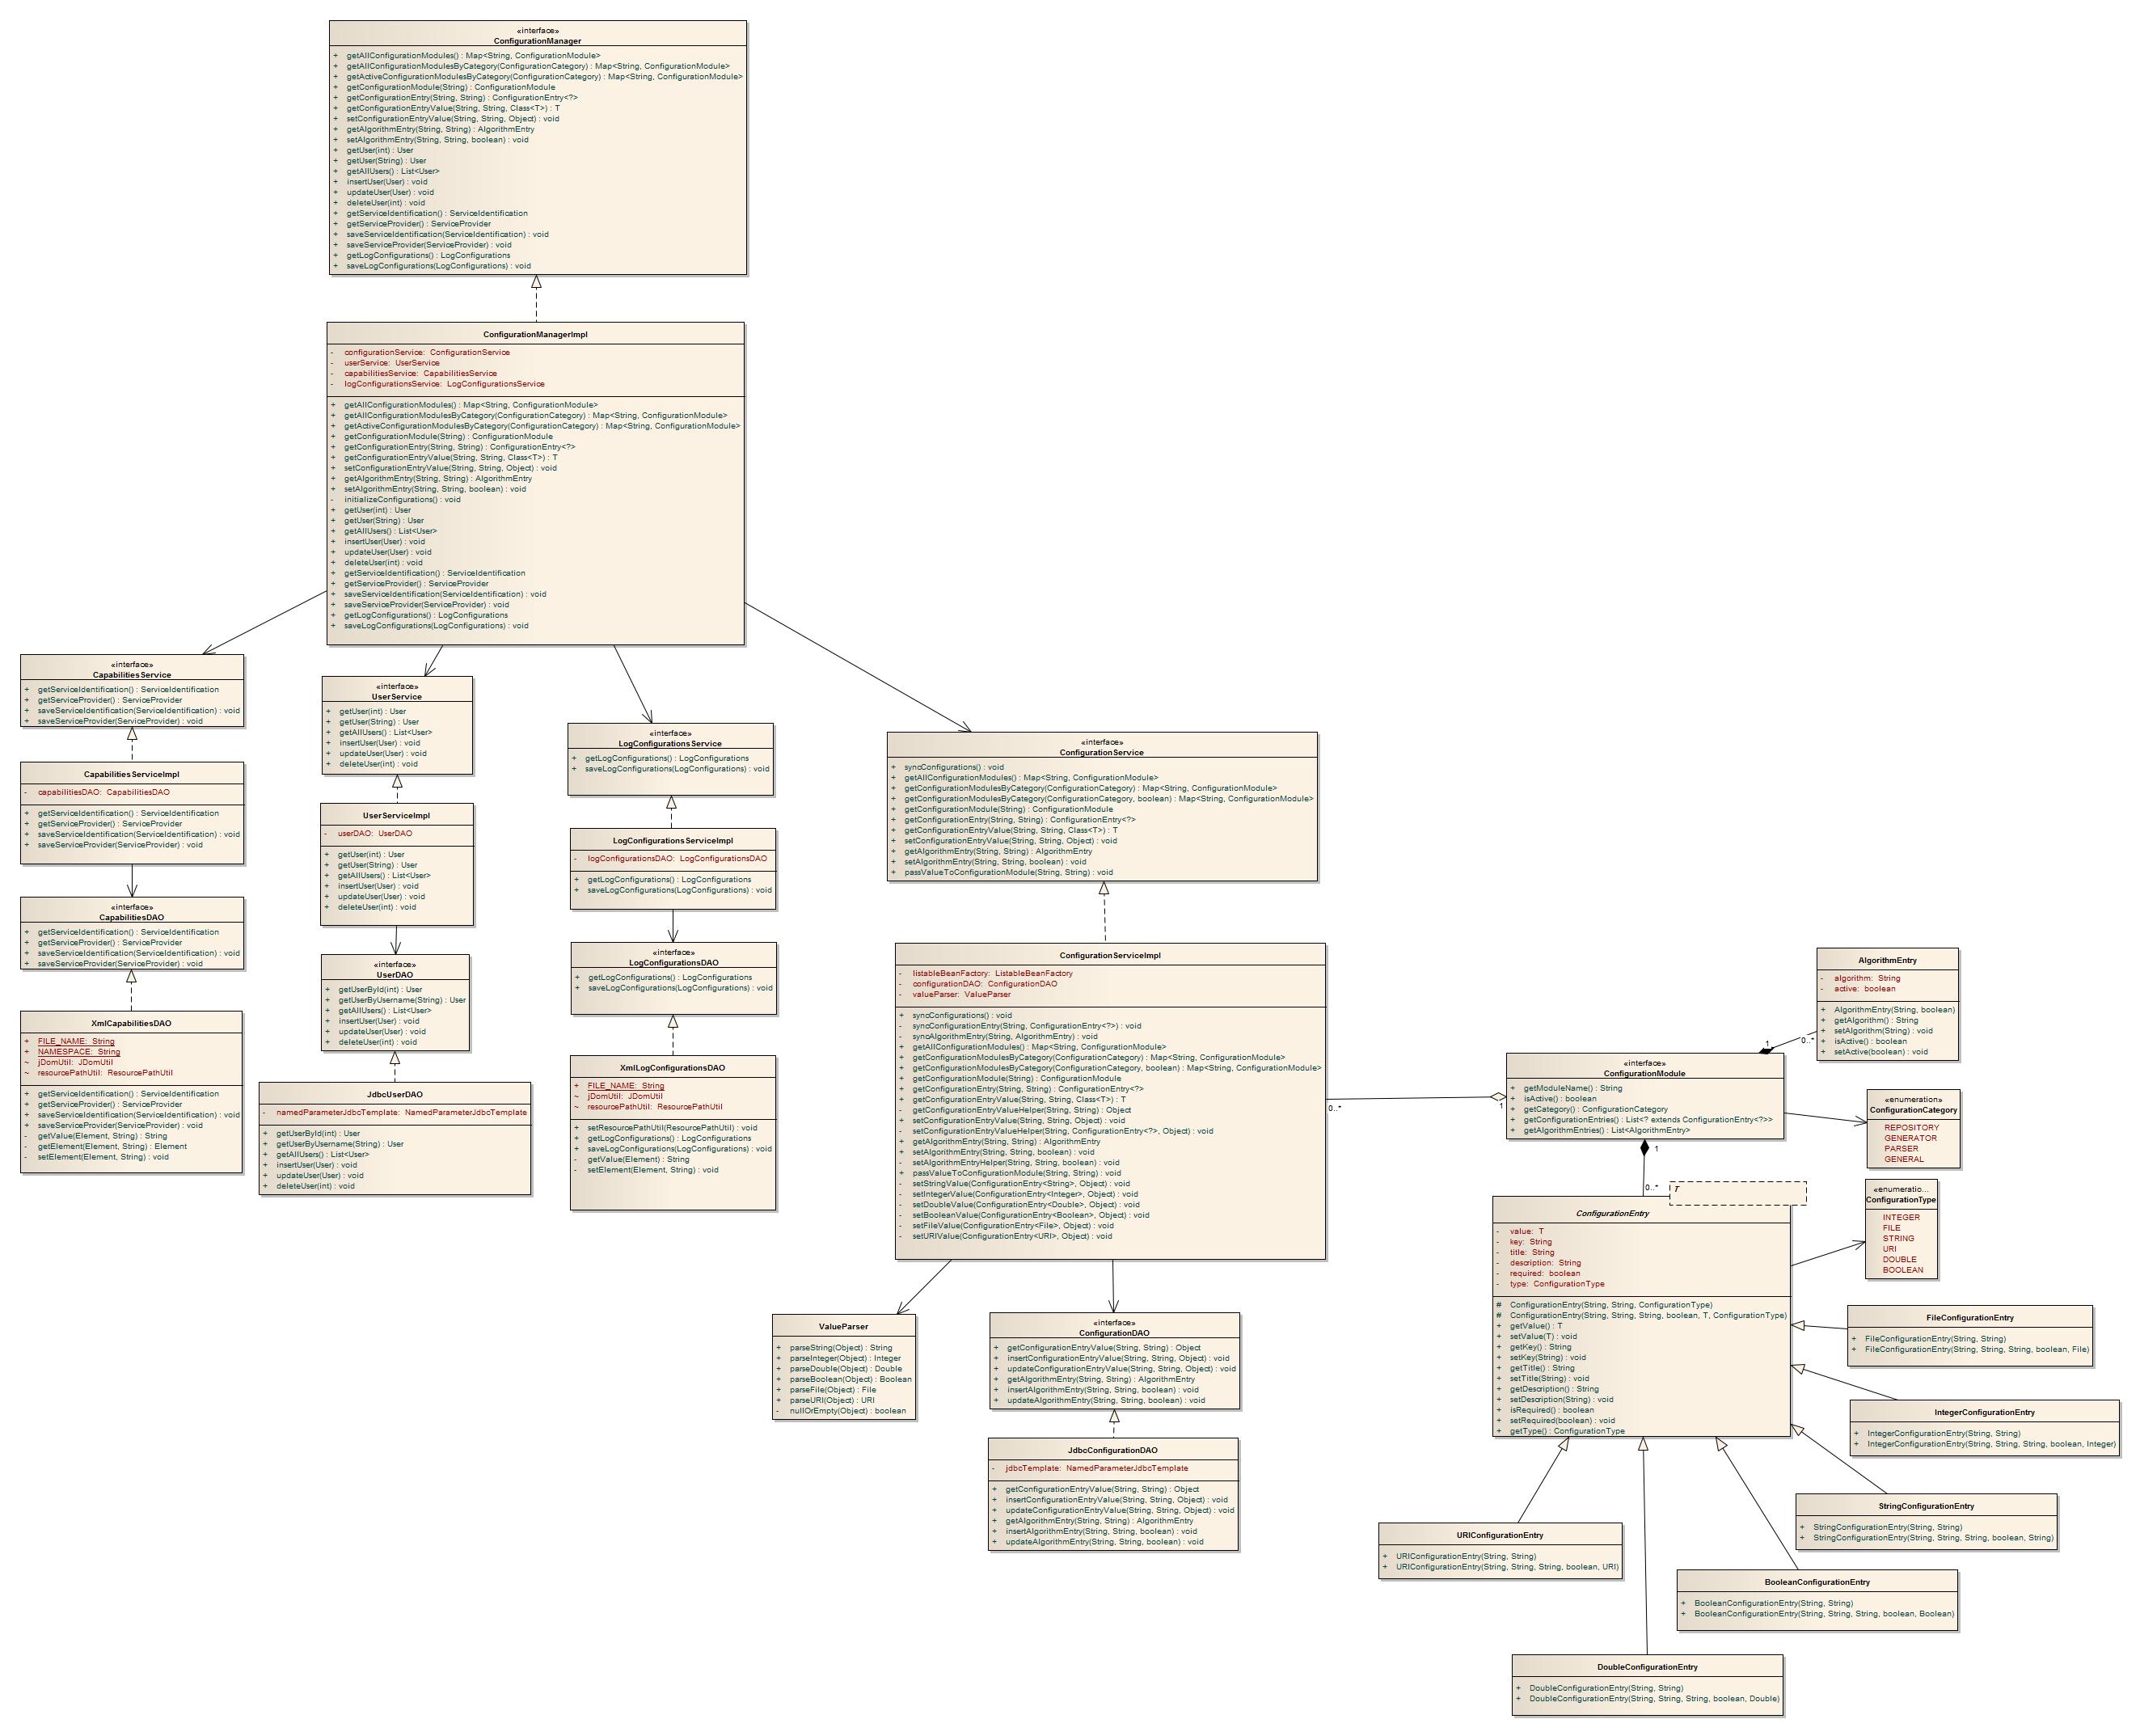 class-diagram-3.png